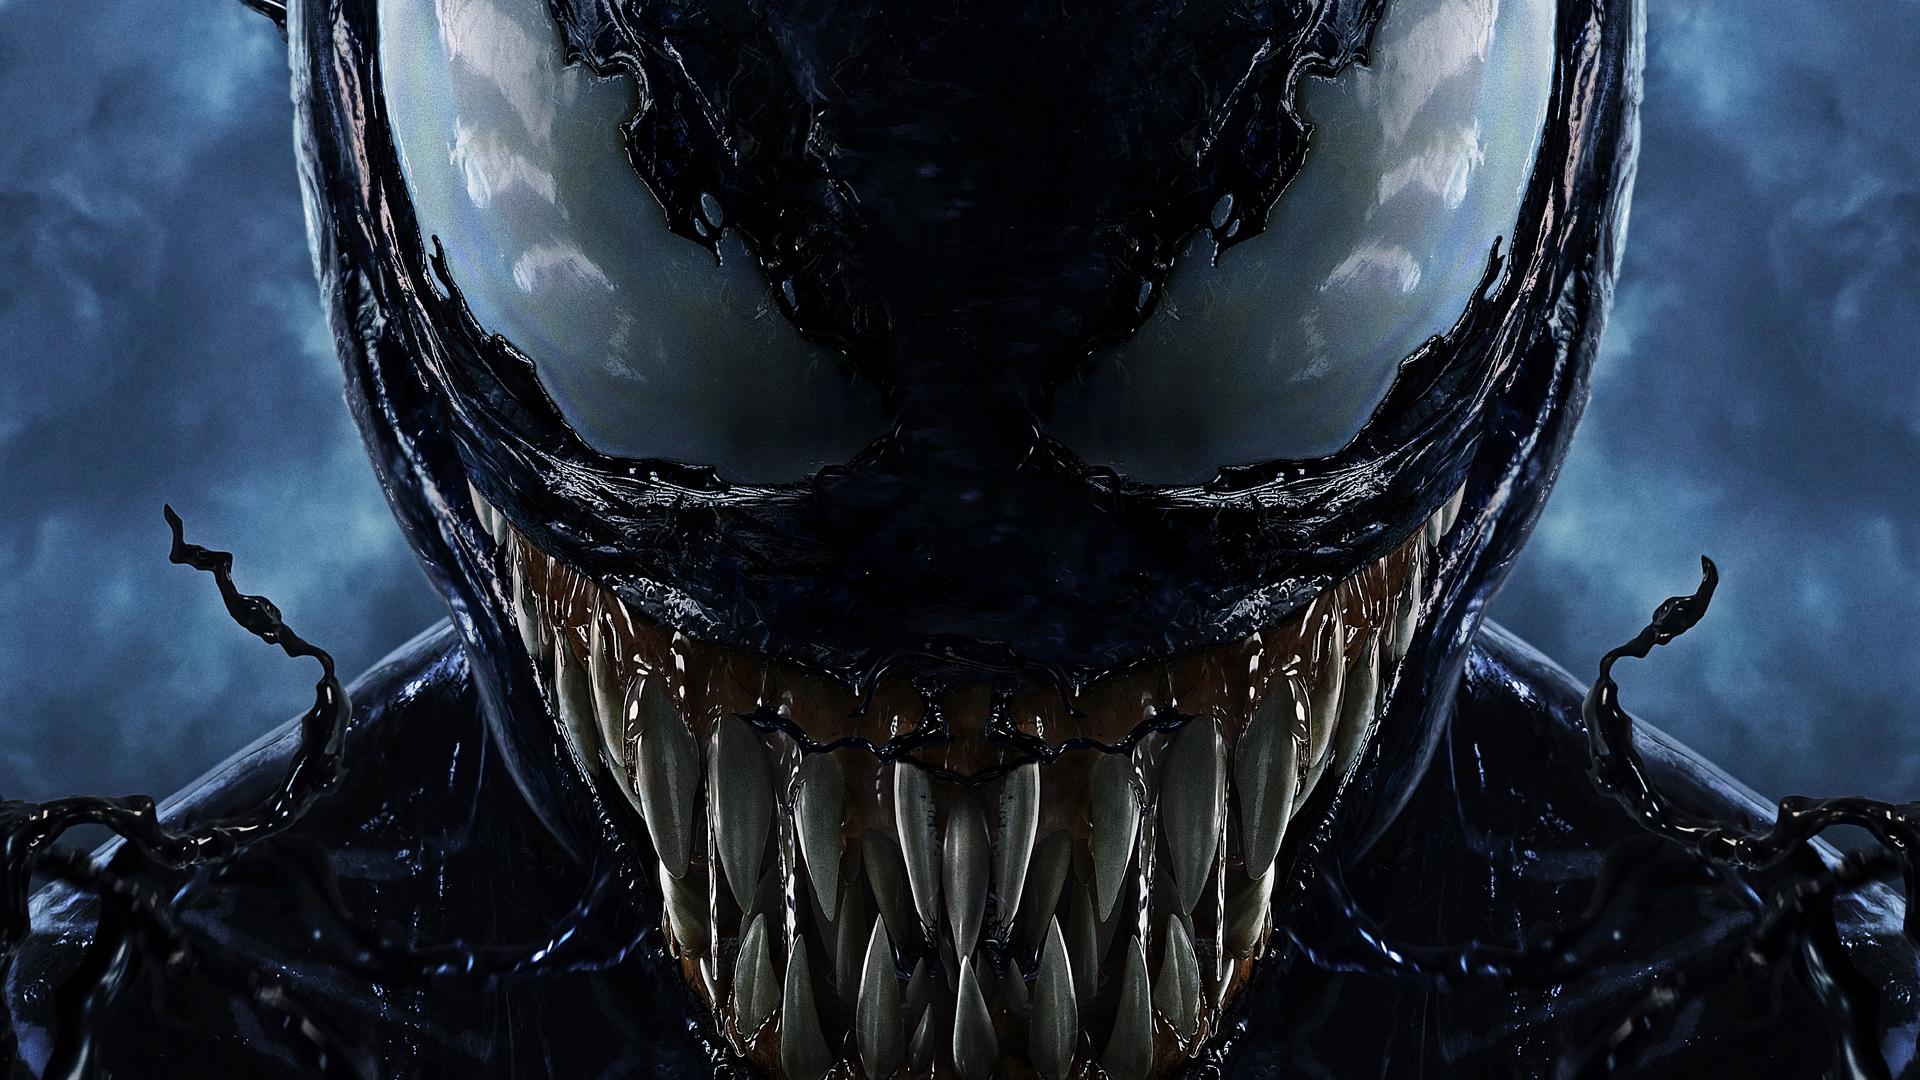 98 1920x1080 Venom Movie Art Laptop Full Hd 1080p Hd 4k Wallpapers